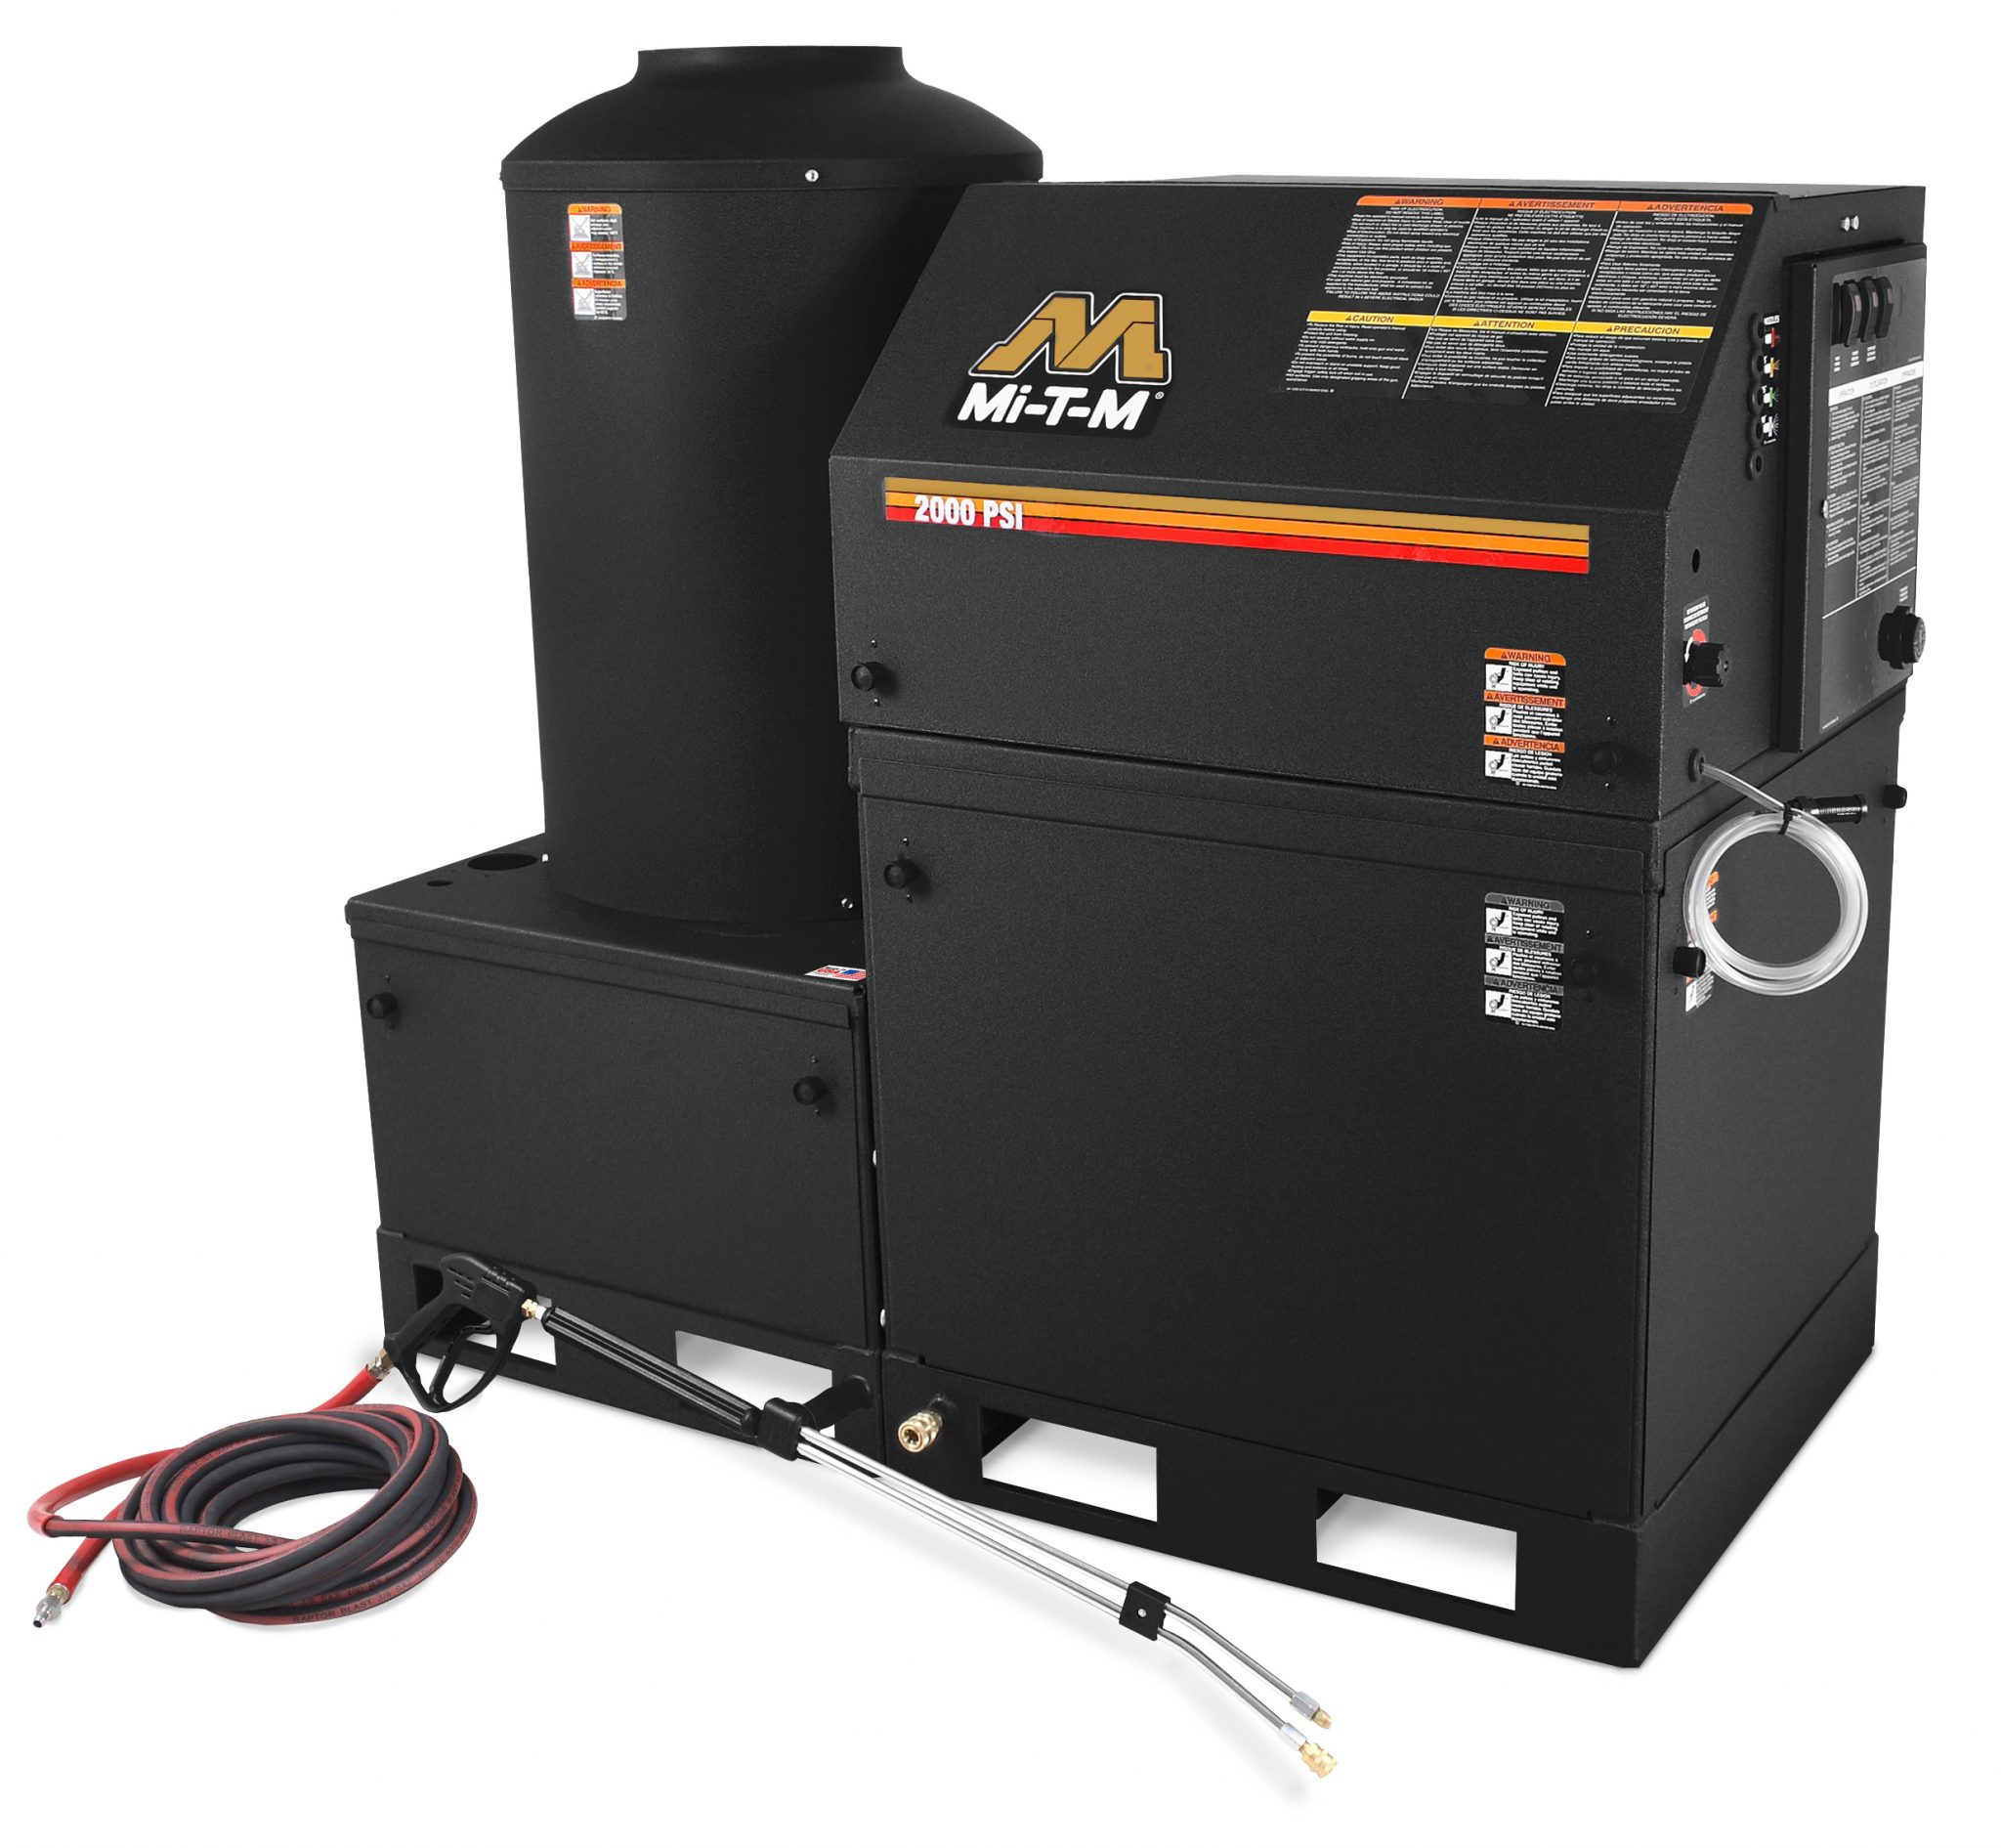 Laveuse à pression (2000PSI, 230V, 4.2GPM) - HEG-2004-0E2G Image